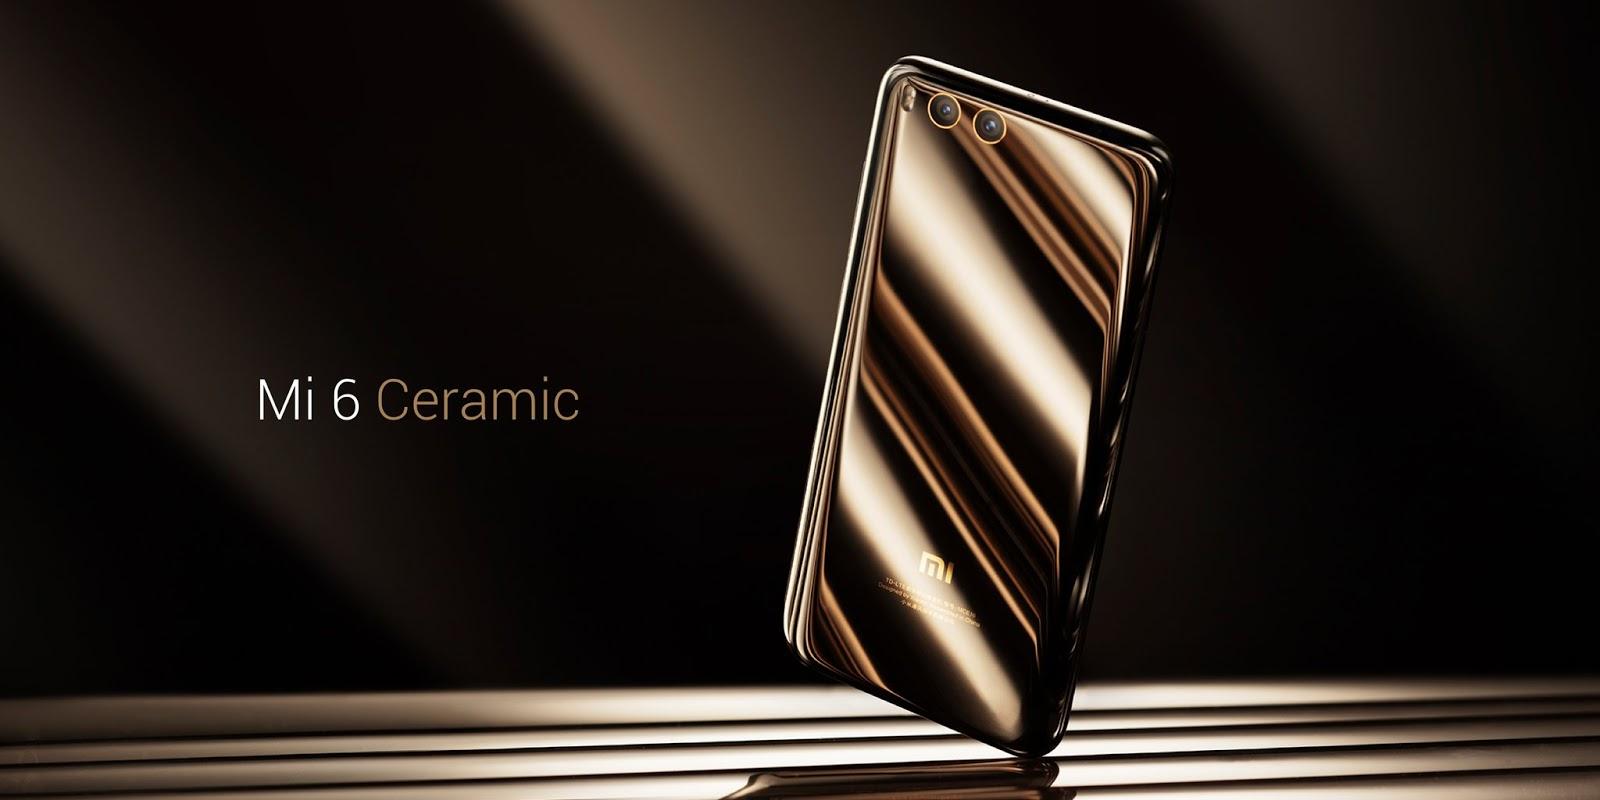 Дождались: Xiaomi Mi 6 представлен официально - 12